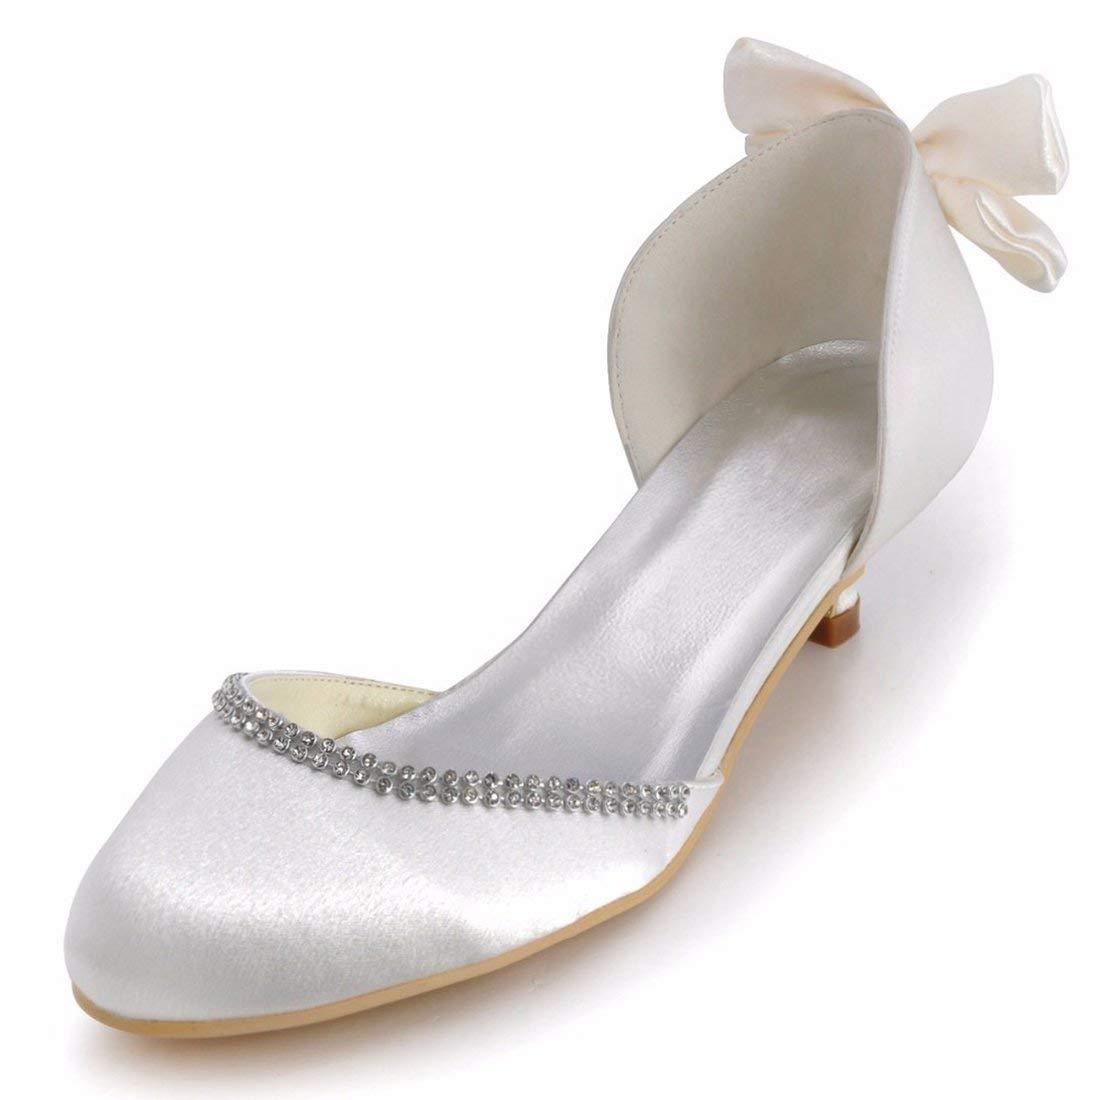 Qiusa Damen Bowknot Bowknot Bowknot 2 Heel Weiß Satin D-Orsay Braut Hochzeit Outdoor Schuhe UK 5 (Farbe   - Größe   -) ec2577